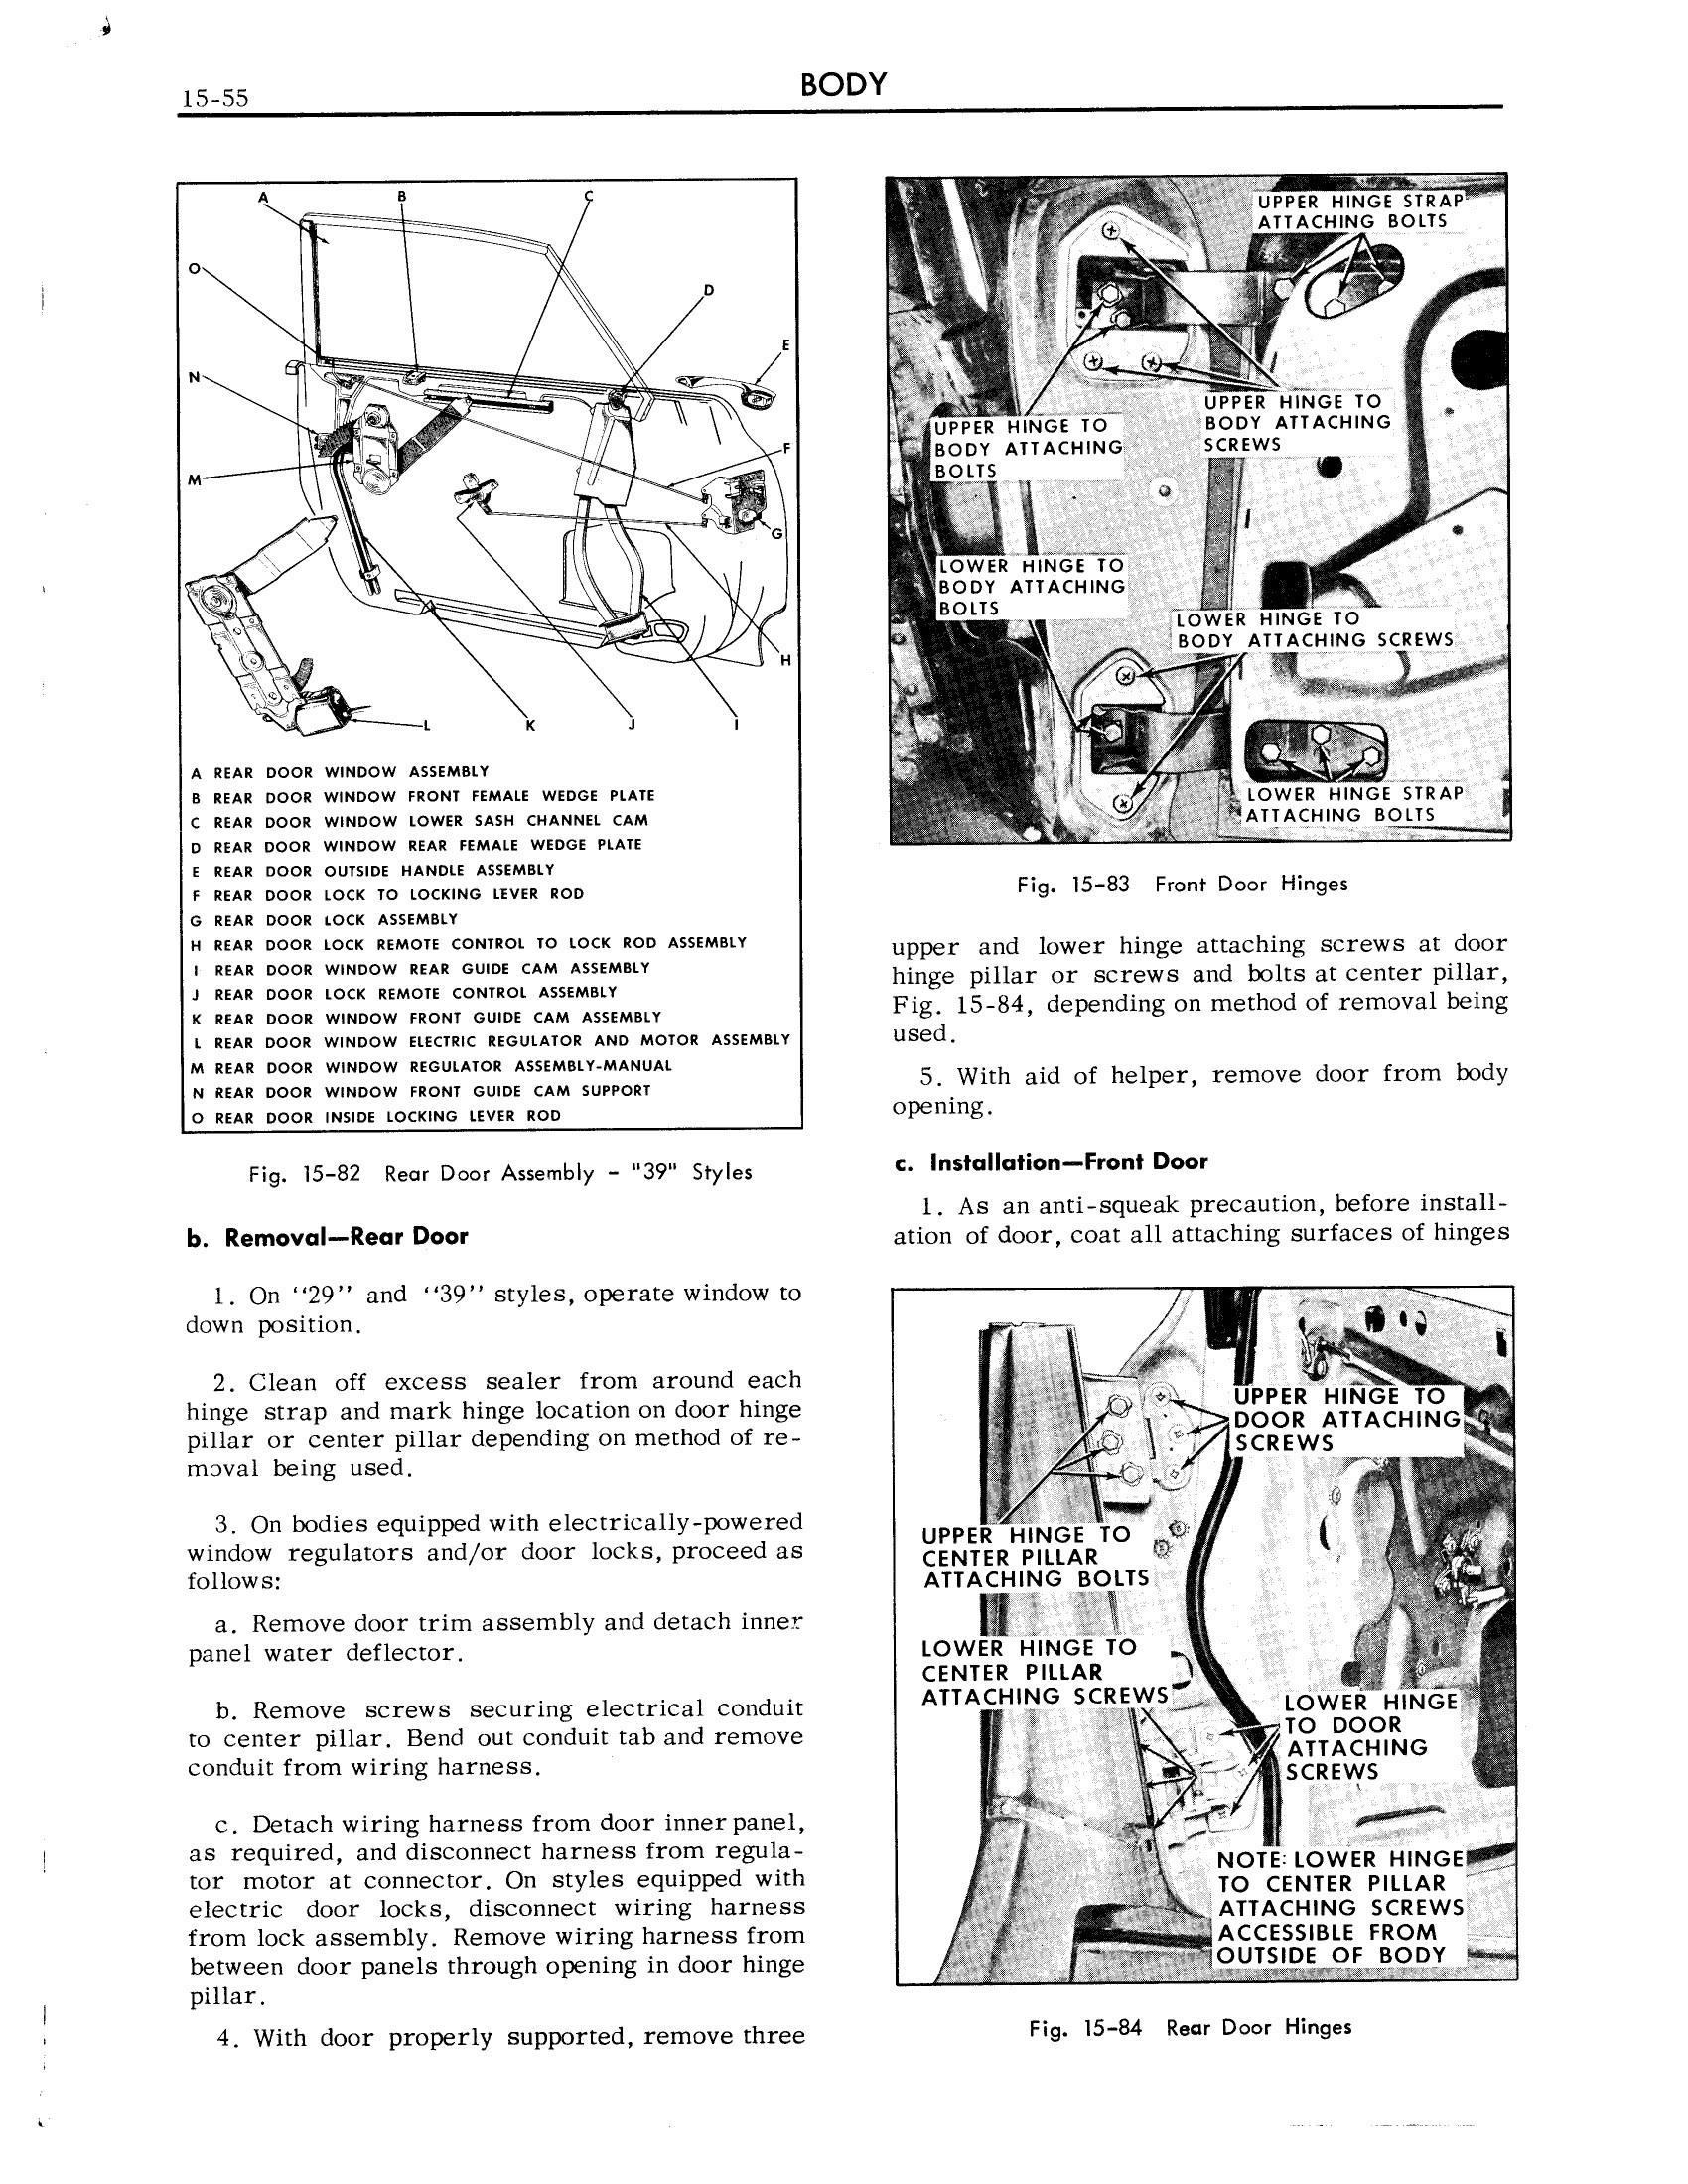 1959 Cadillac Shop Manual- Body Page 55 of 99